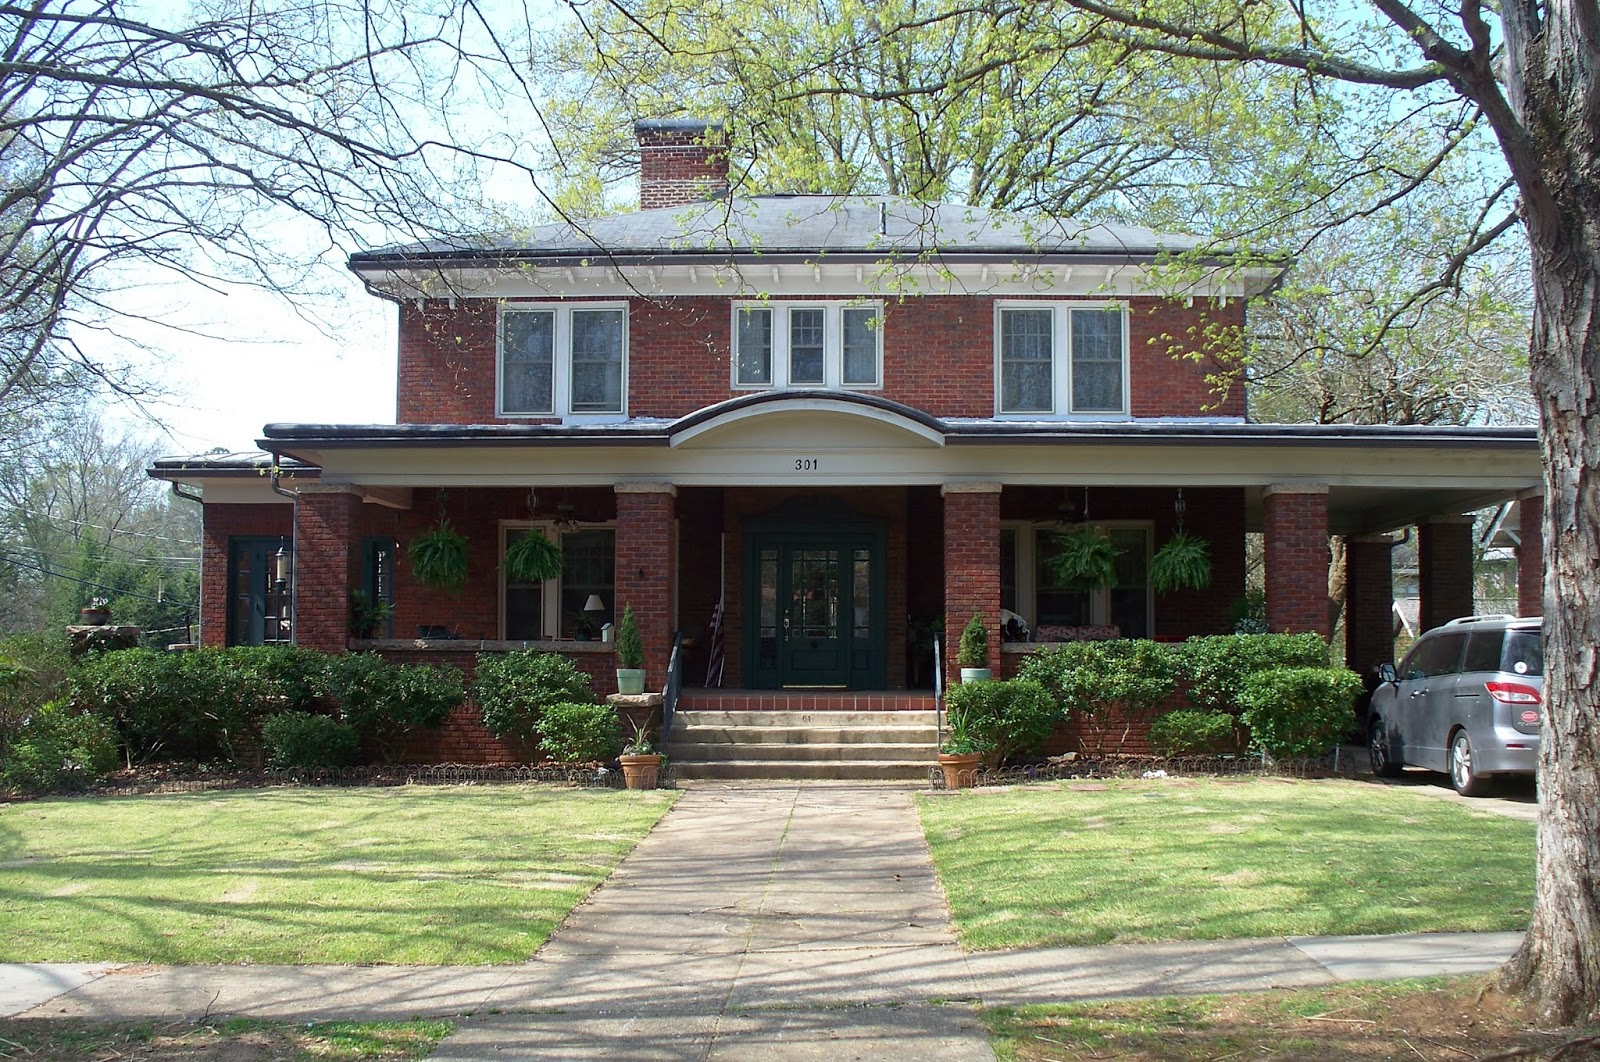 Salisbury north carolina real estate solid brick 3500 for House plans nc